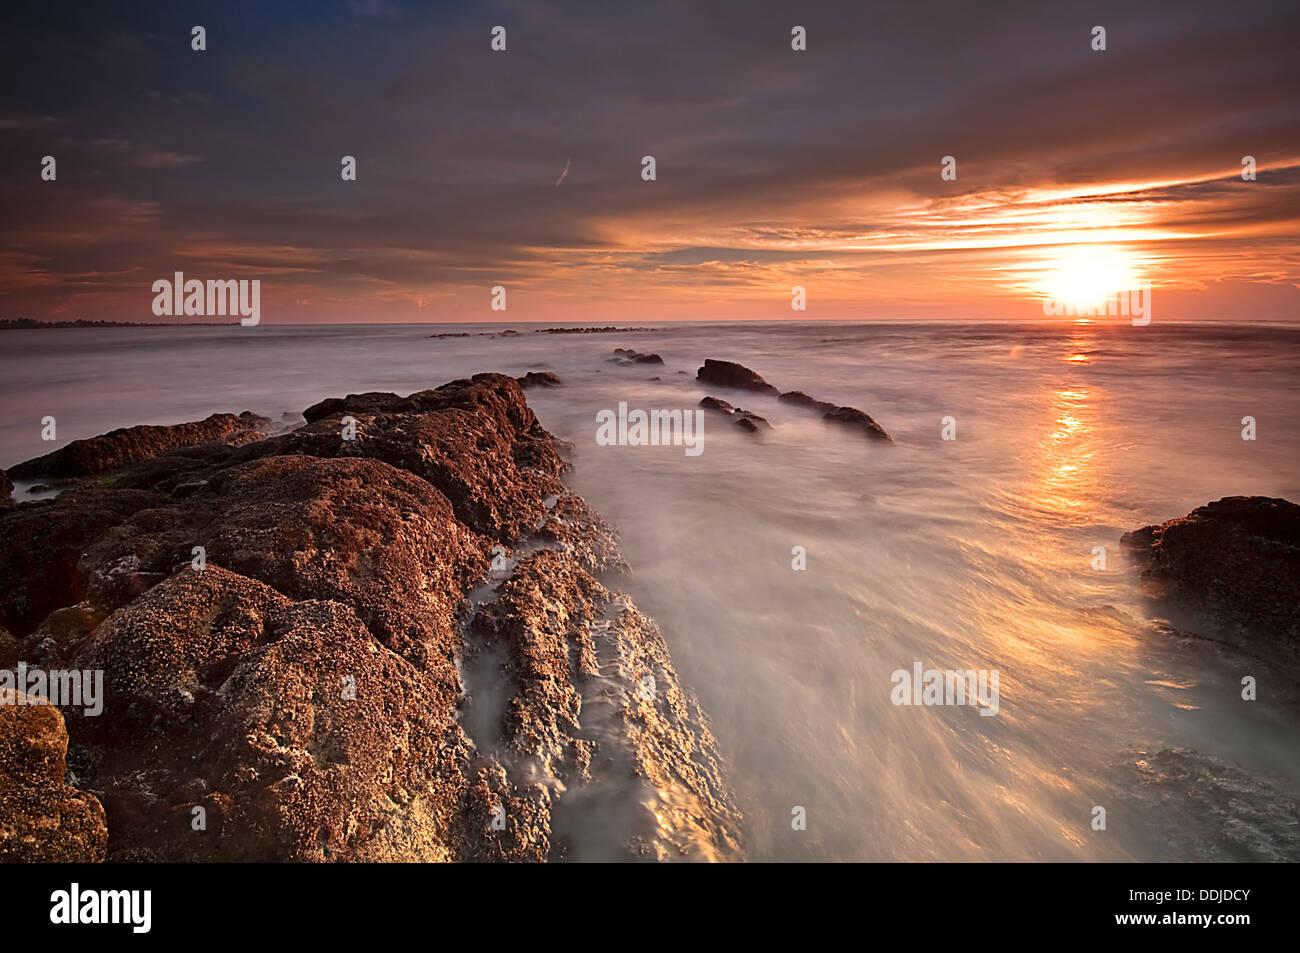 Dusk Bungai Coast, inland of Miri in Sarawak - Stock Image